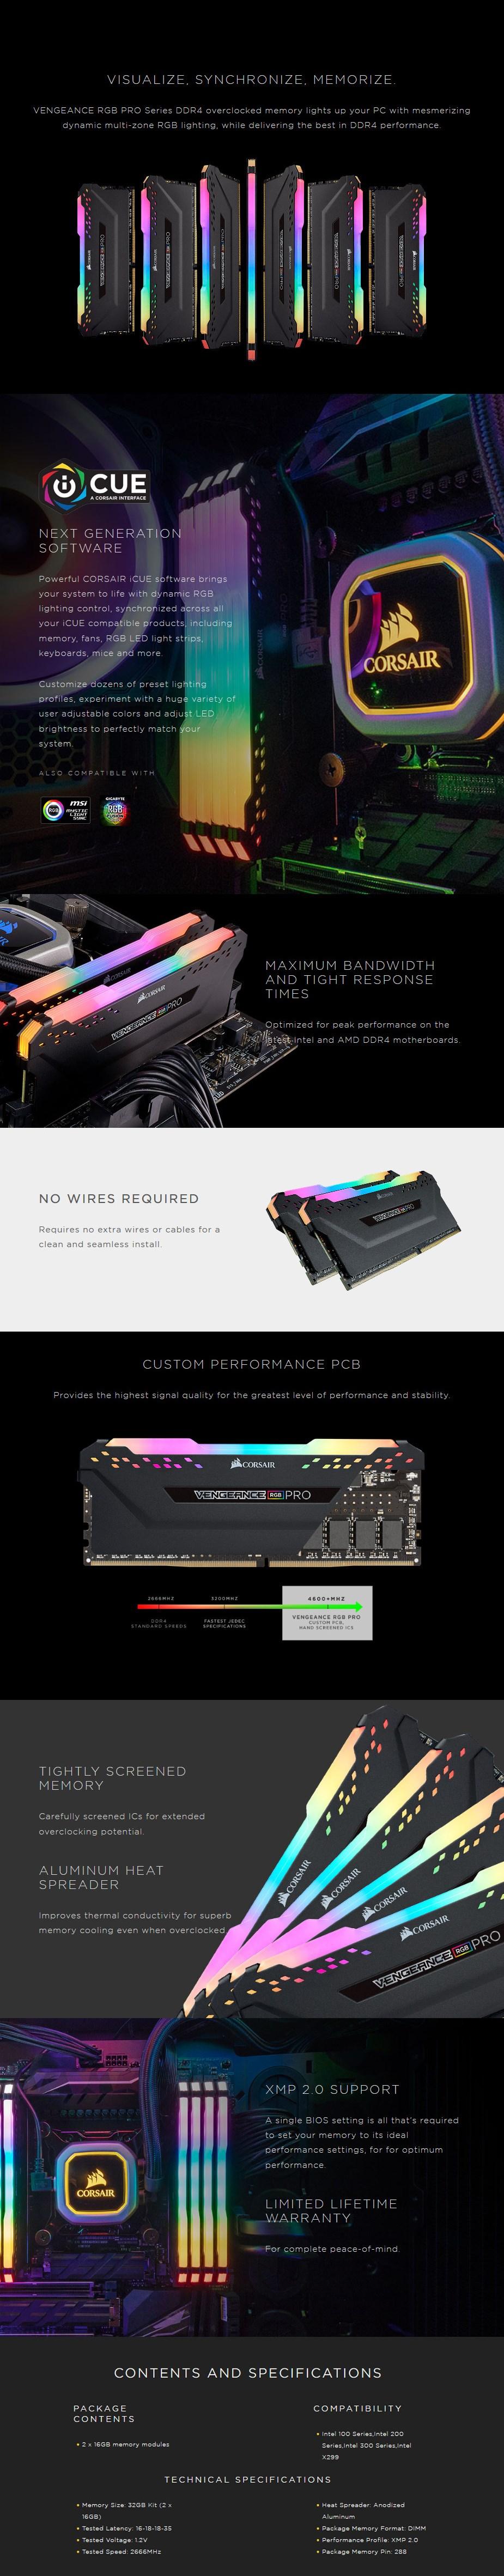 Corsair Vengeance RGB PRO 32GB (2x 16GB) DDR4 2666MHz Memory - Black - Desktop Overview